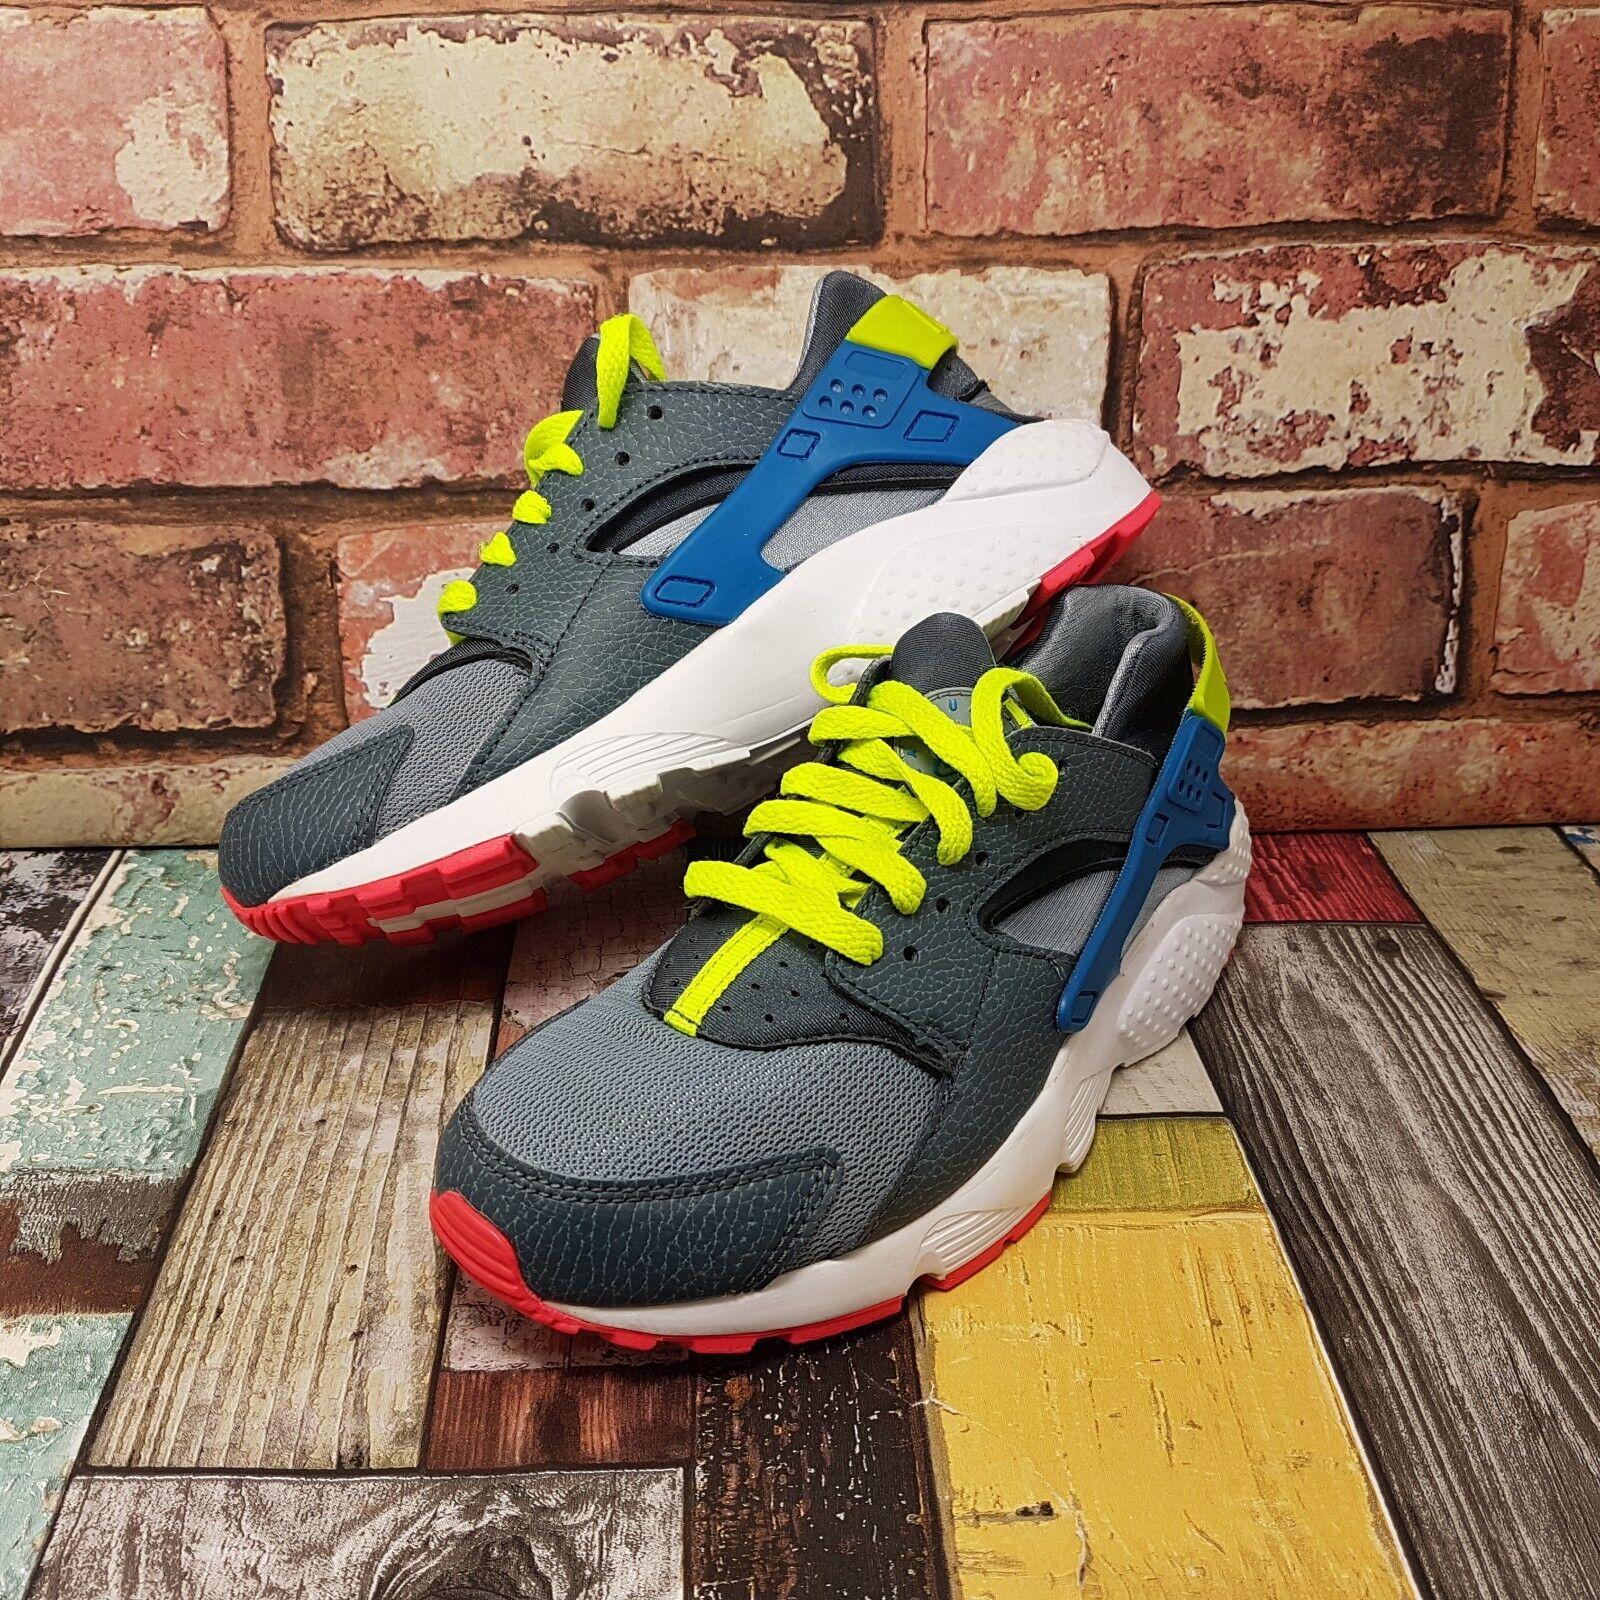 Nike air huarache formatori dimensioni dimensioni dimensioni grigio le donne scarpe scarpe ue 37   Sito Ufficiale  bf1025